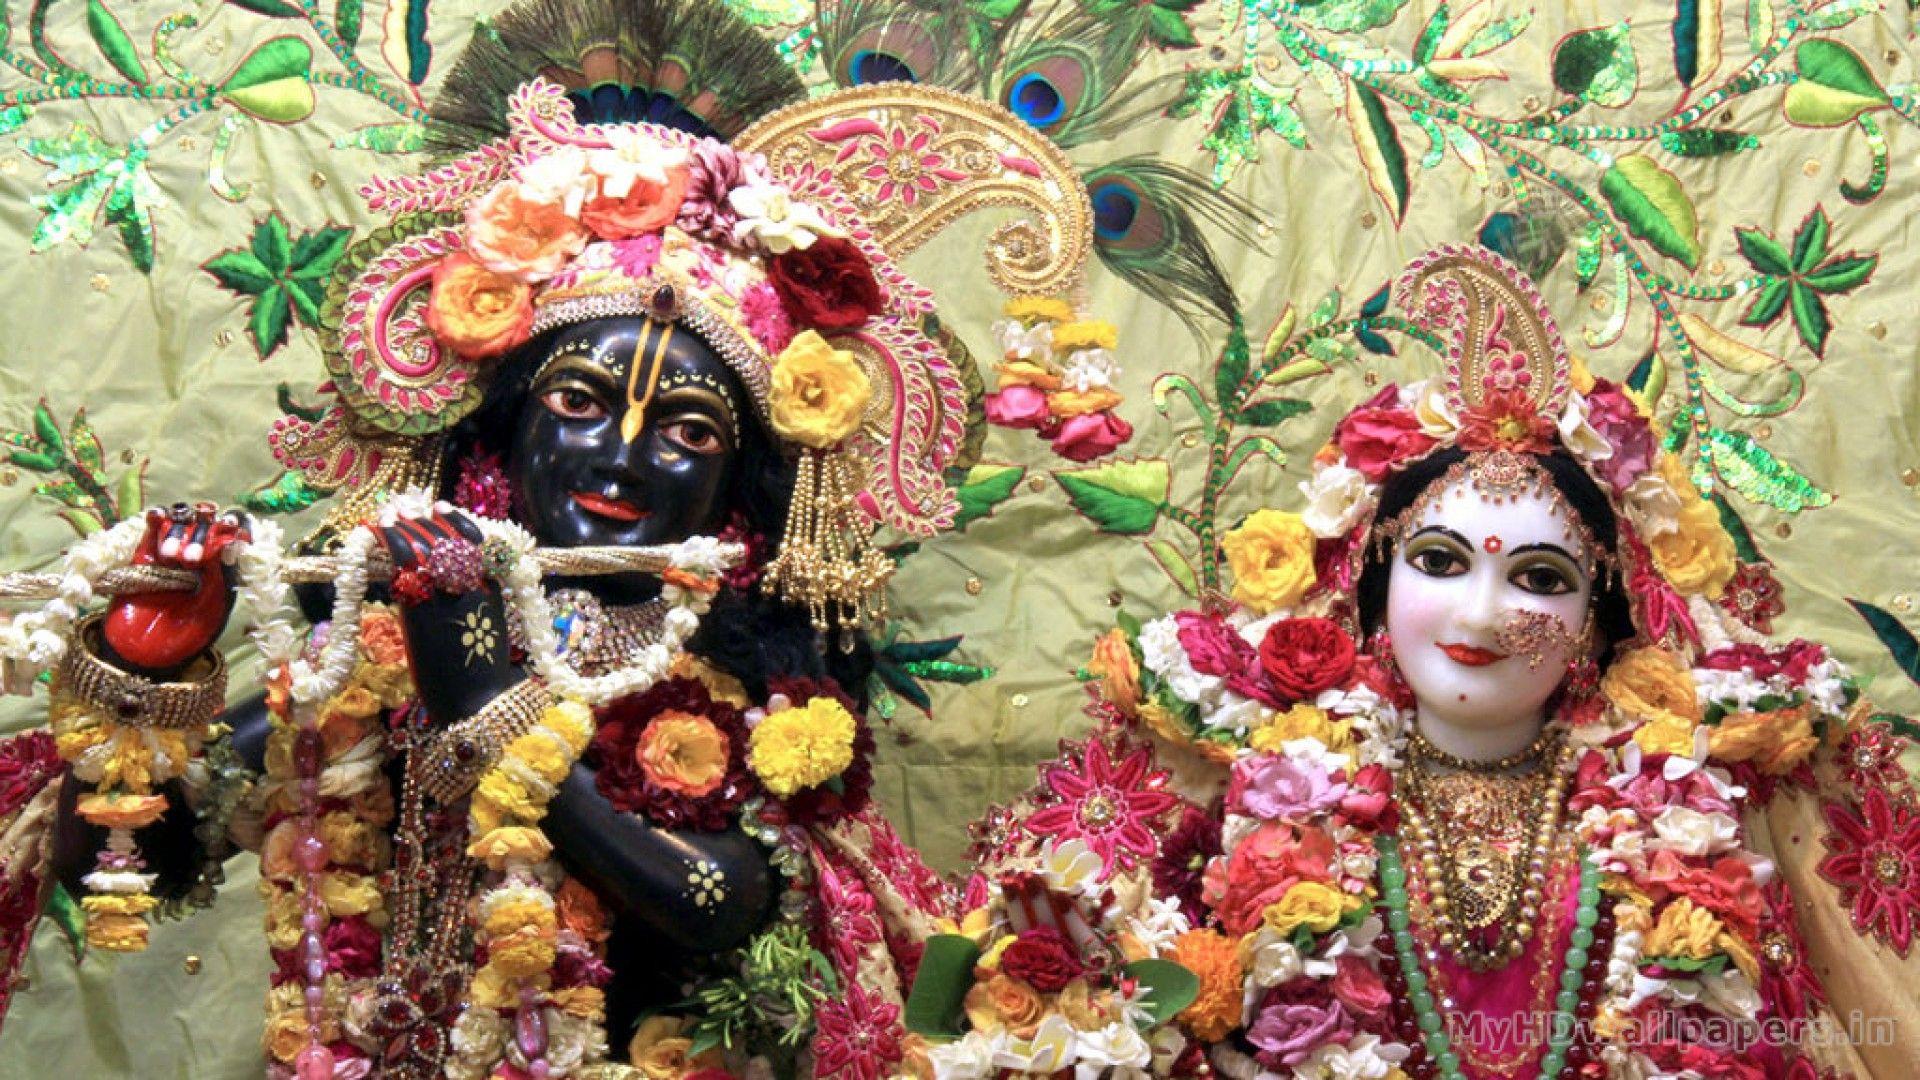 Hd wallpaper krishna download - Click Here To Download In Hd Format Radha Krishna Wallpaper For Pc Http